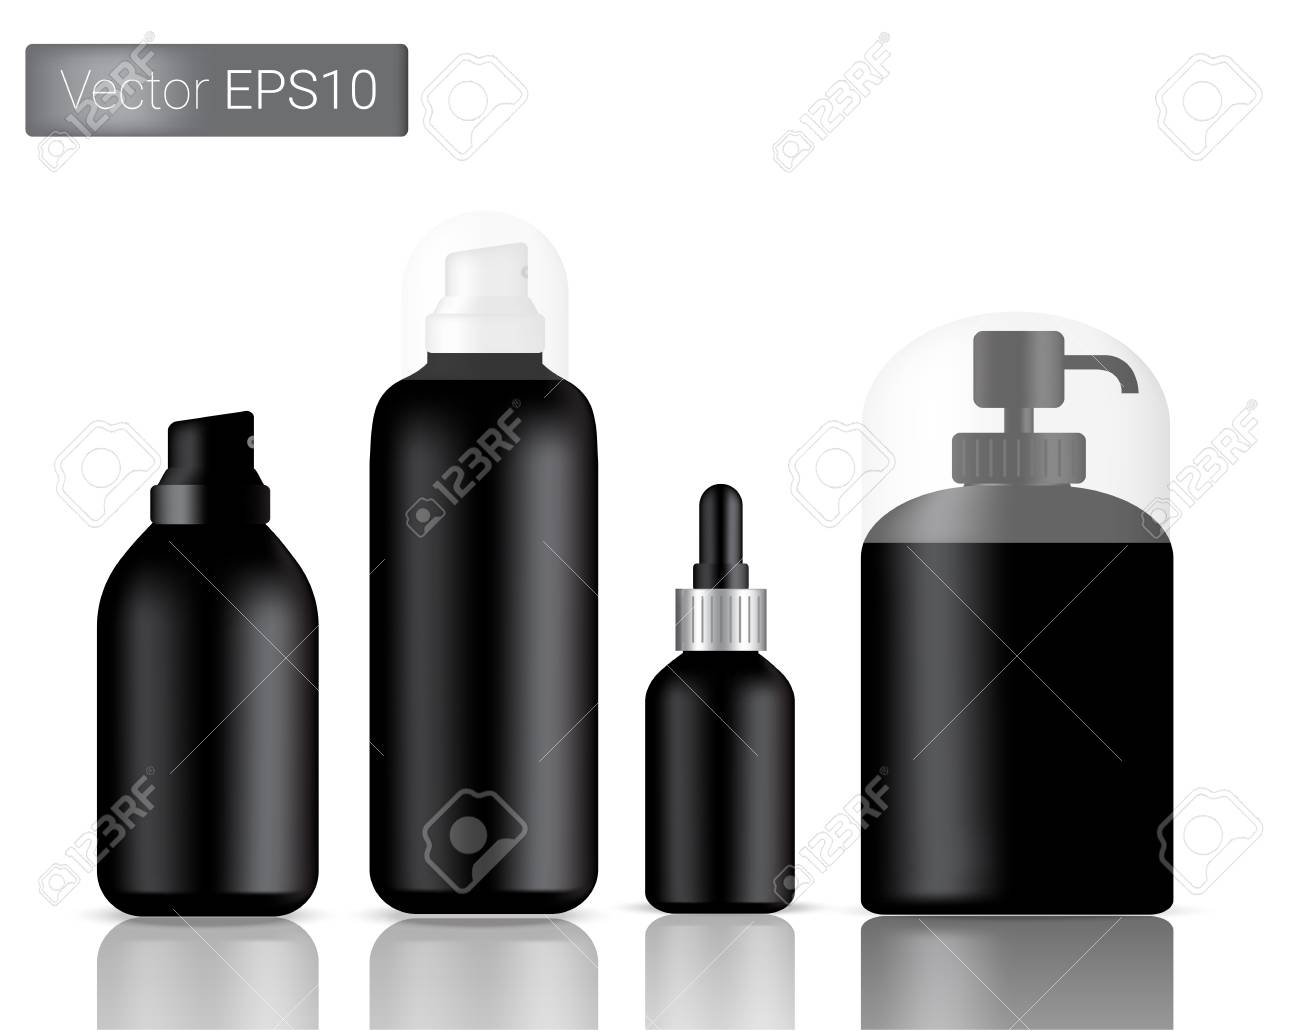 bbe87692ede1 Glass Spray Bottles Set Background Illustration